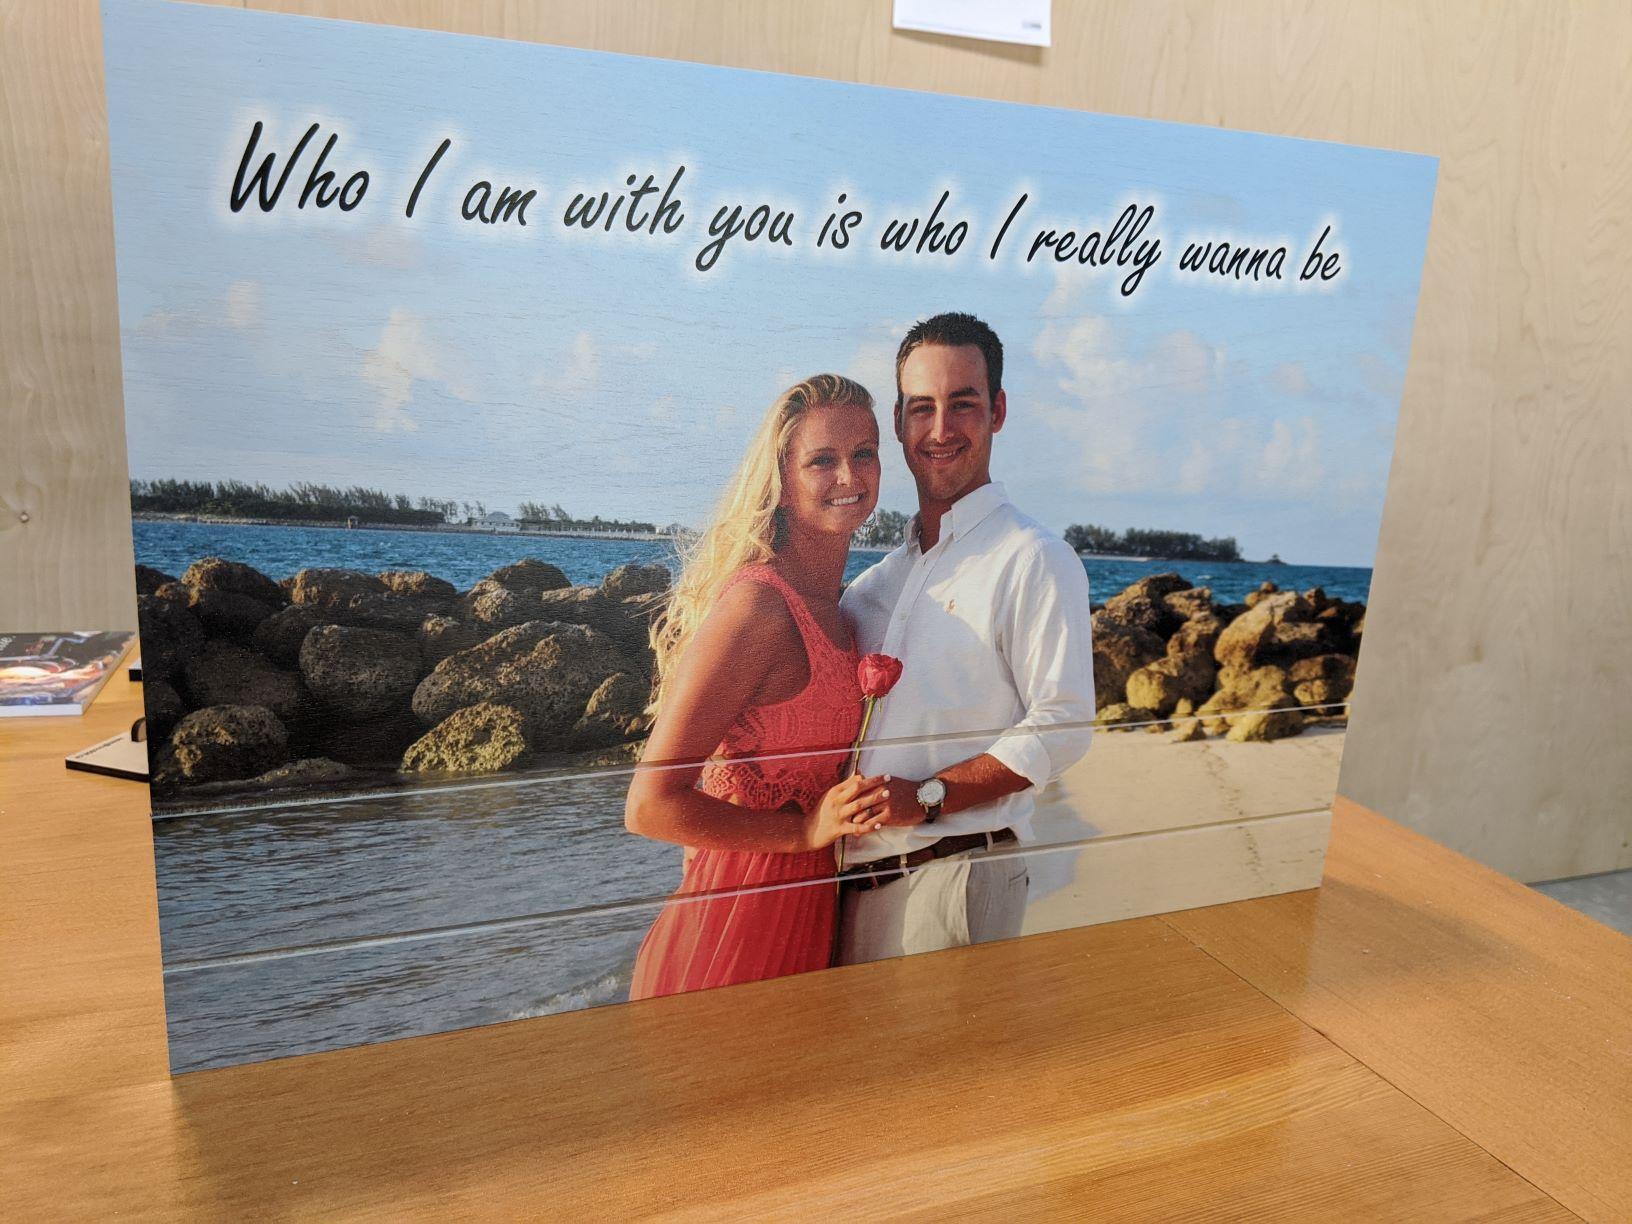 Photo printed on wood with slats